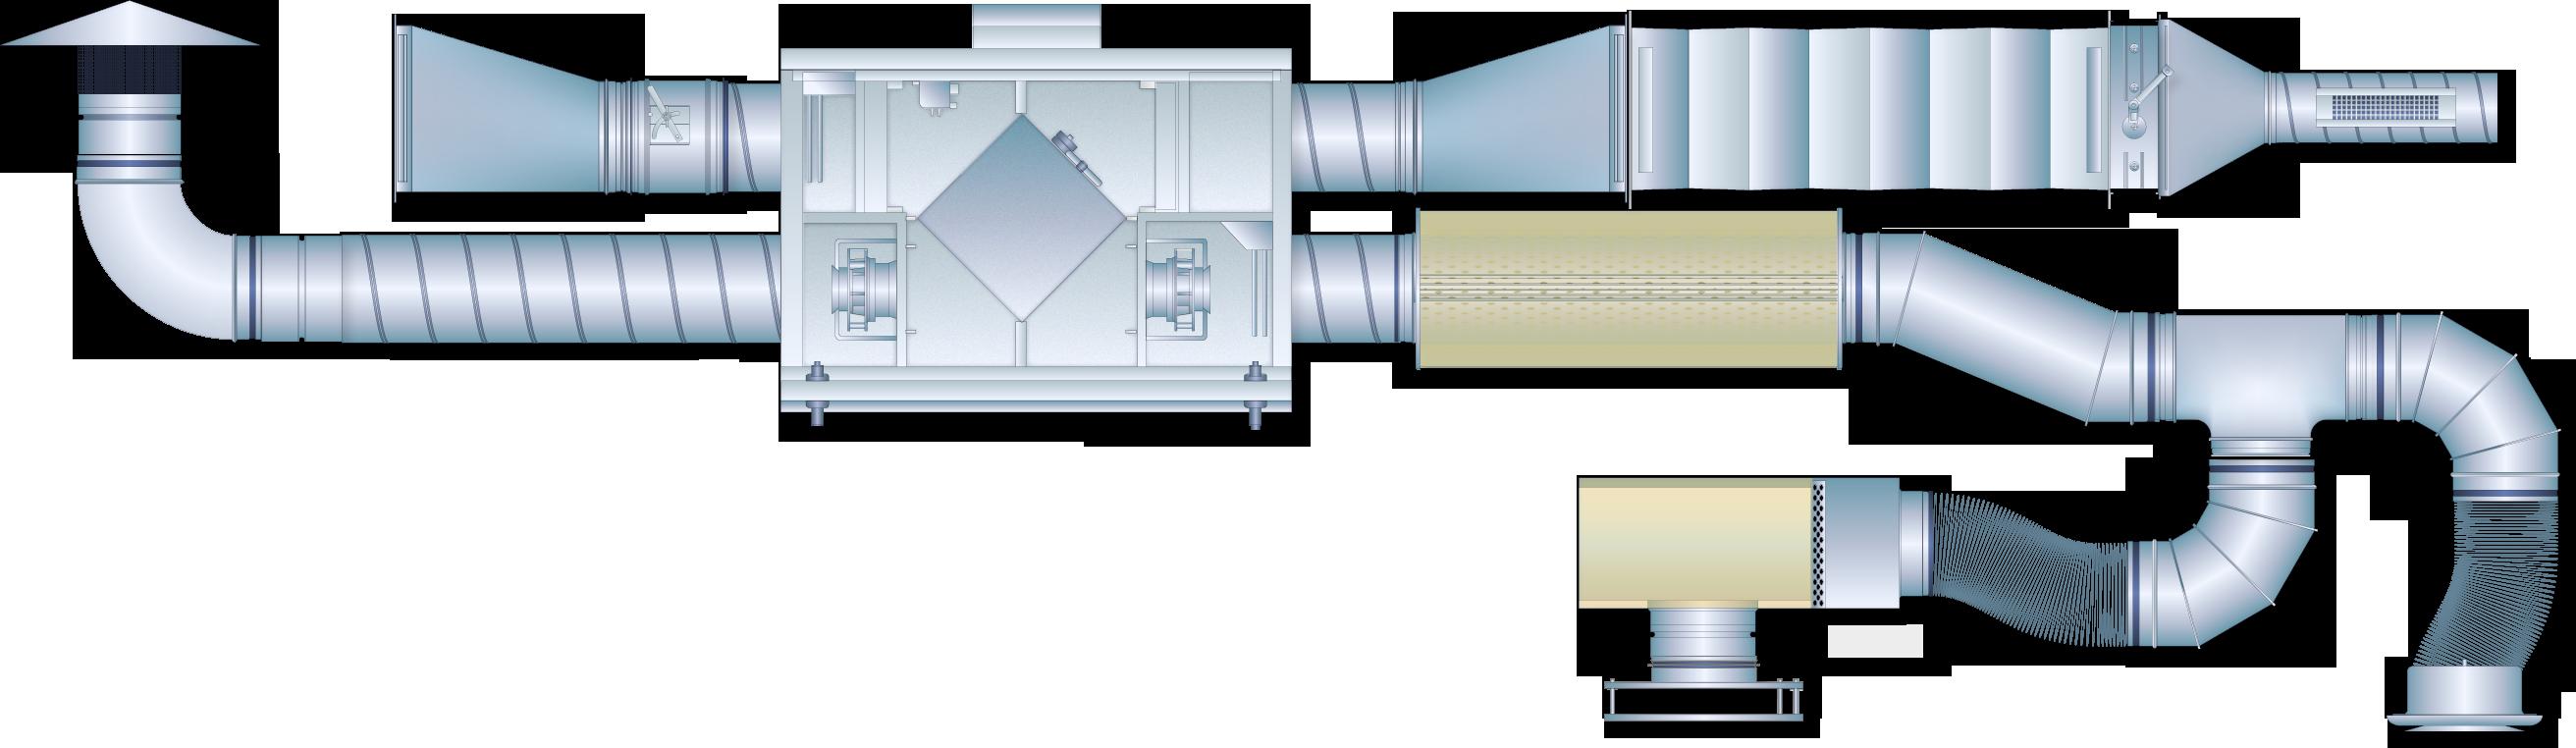 Vėdinimo sistema